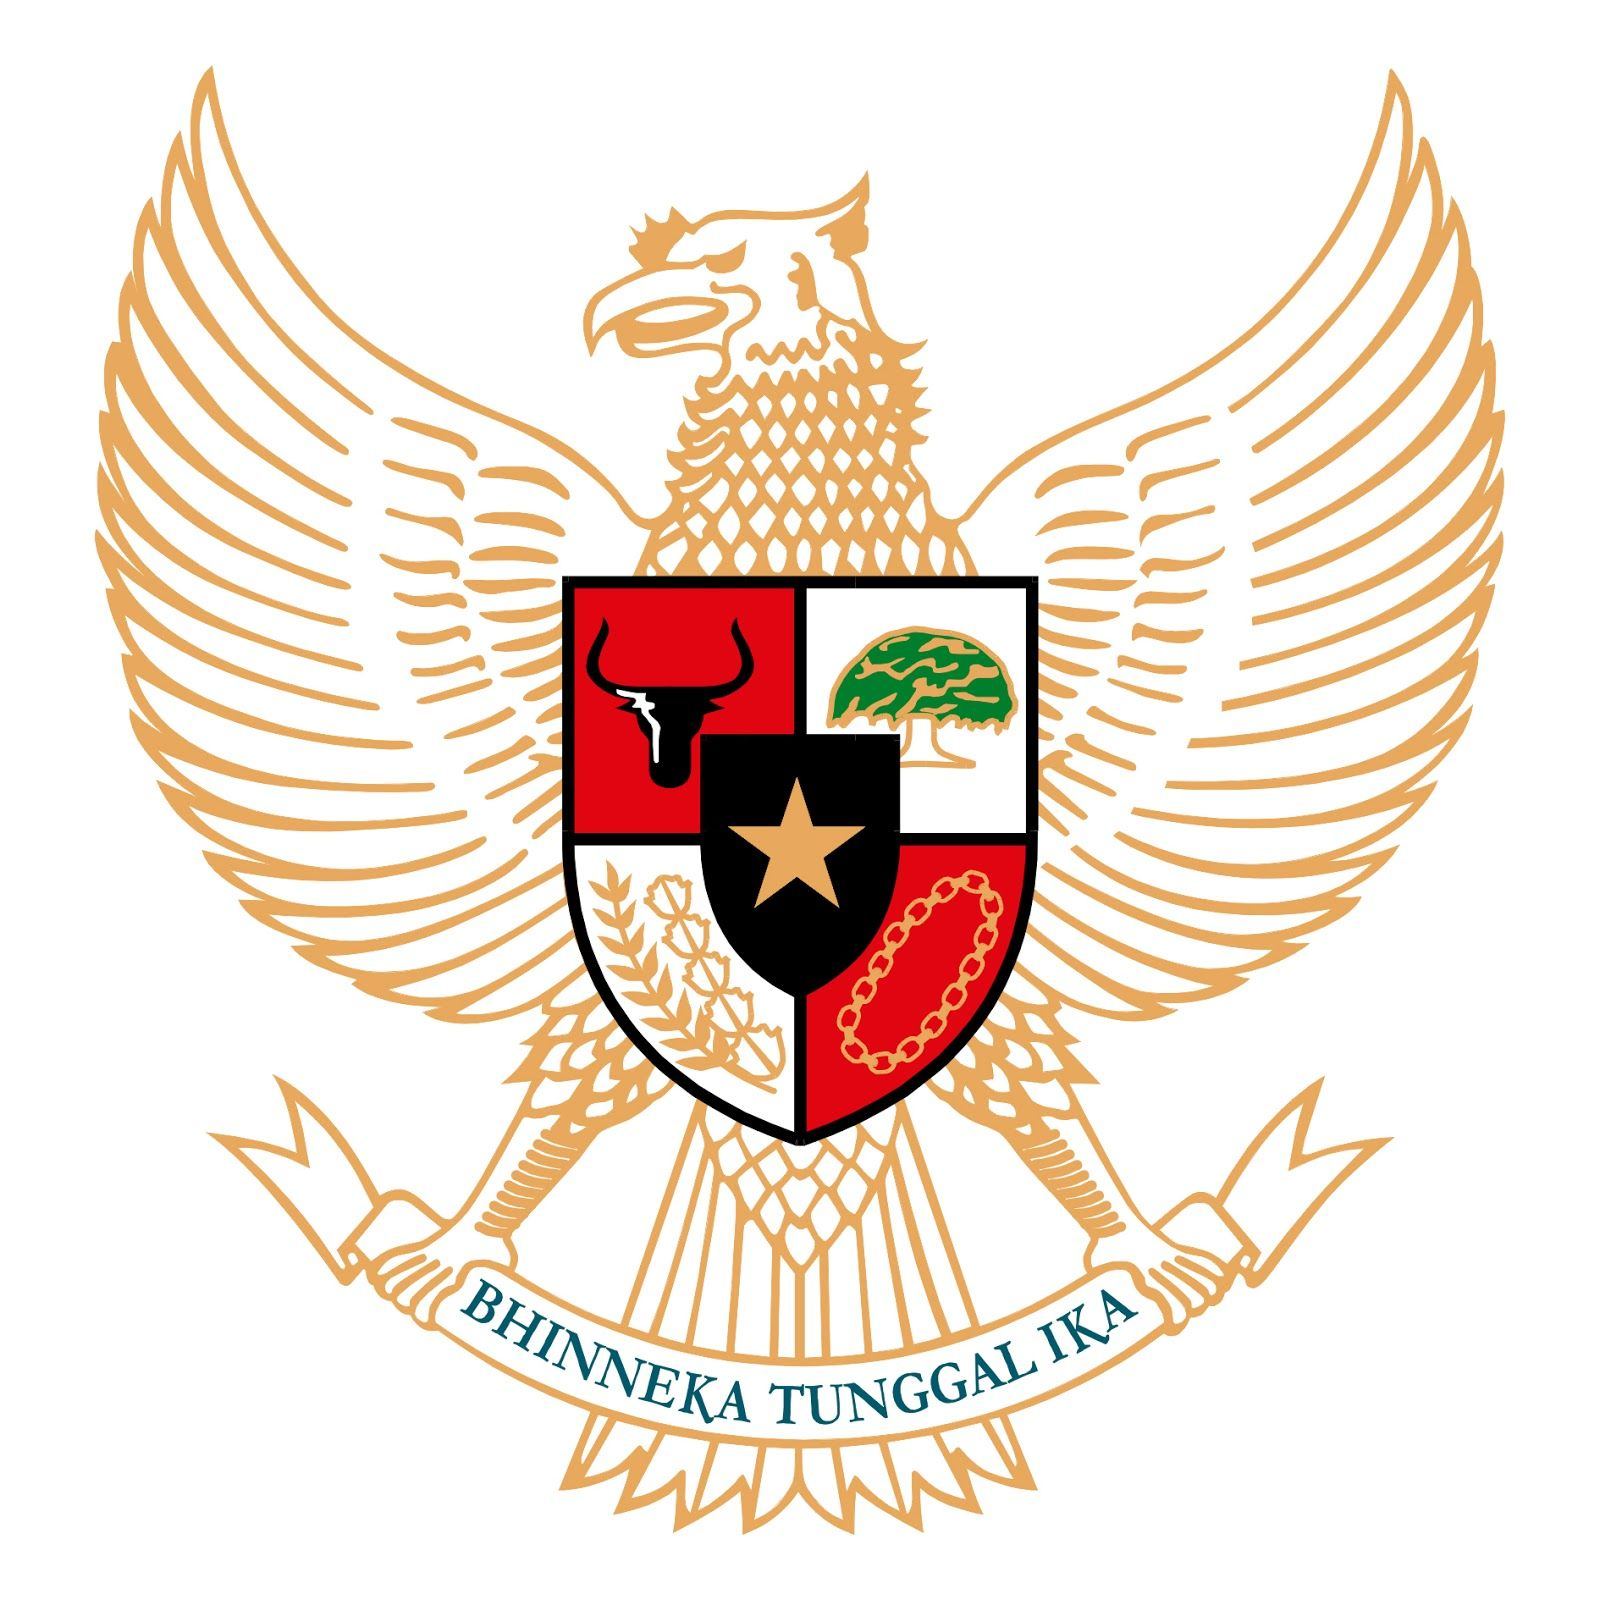 Logo Garuda Pancasila Emas Lambang Negara Buku Mewarnai Gambar Sayap